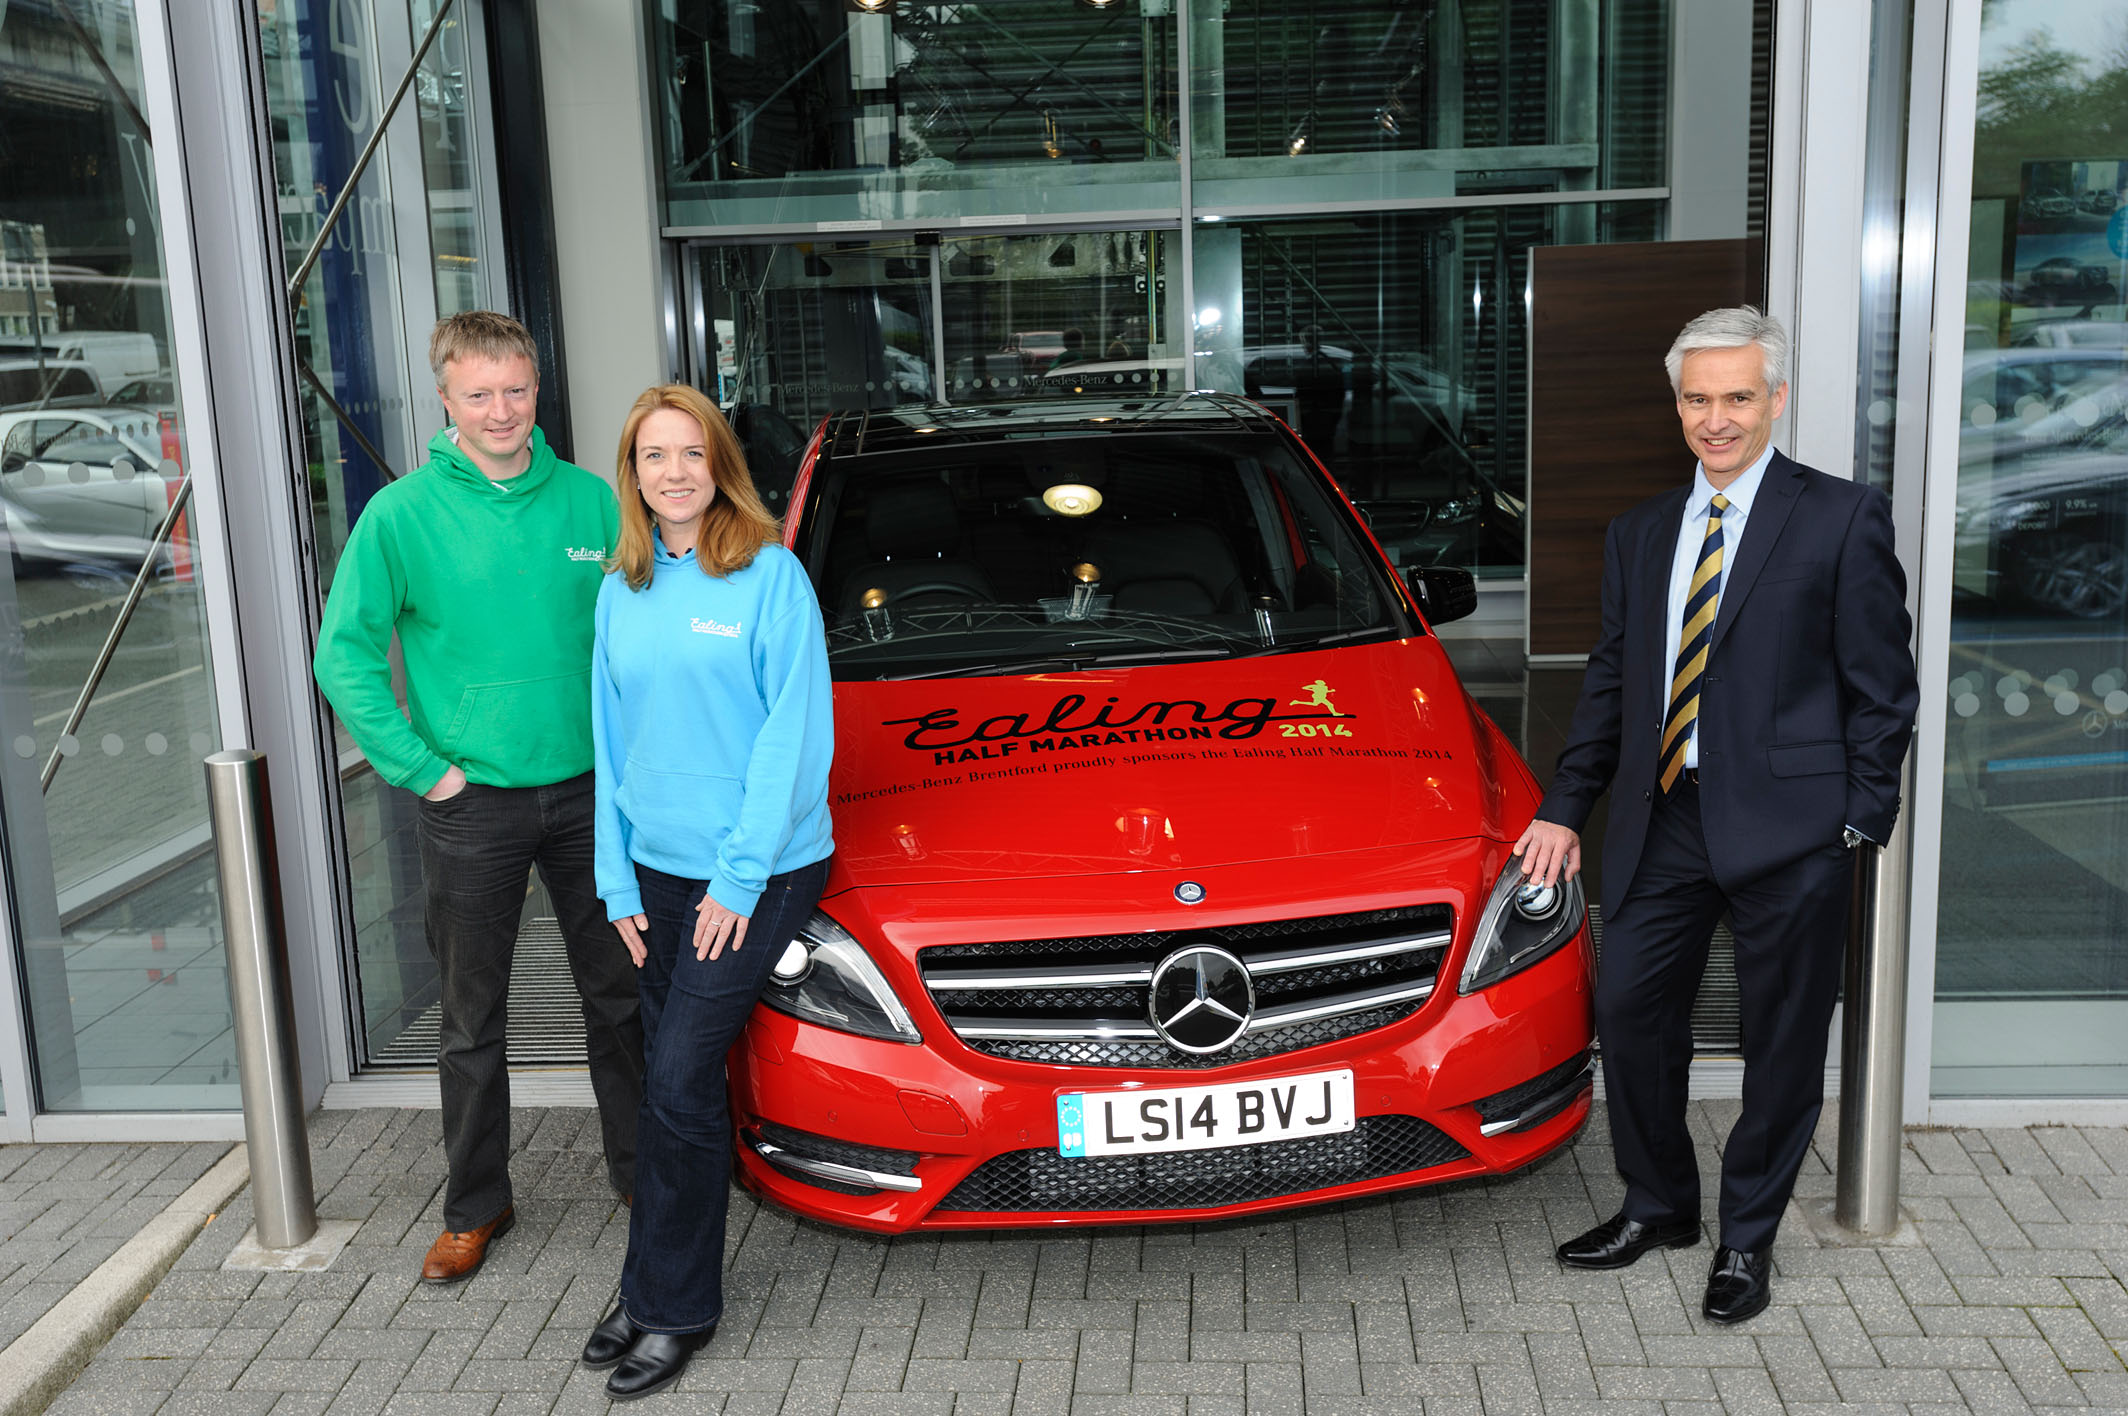 Mercedes half marathon mercedes marathon autos post for Mercedes benz marathon birmingham